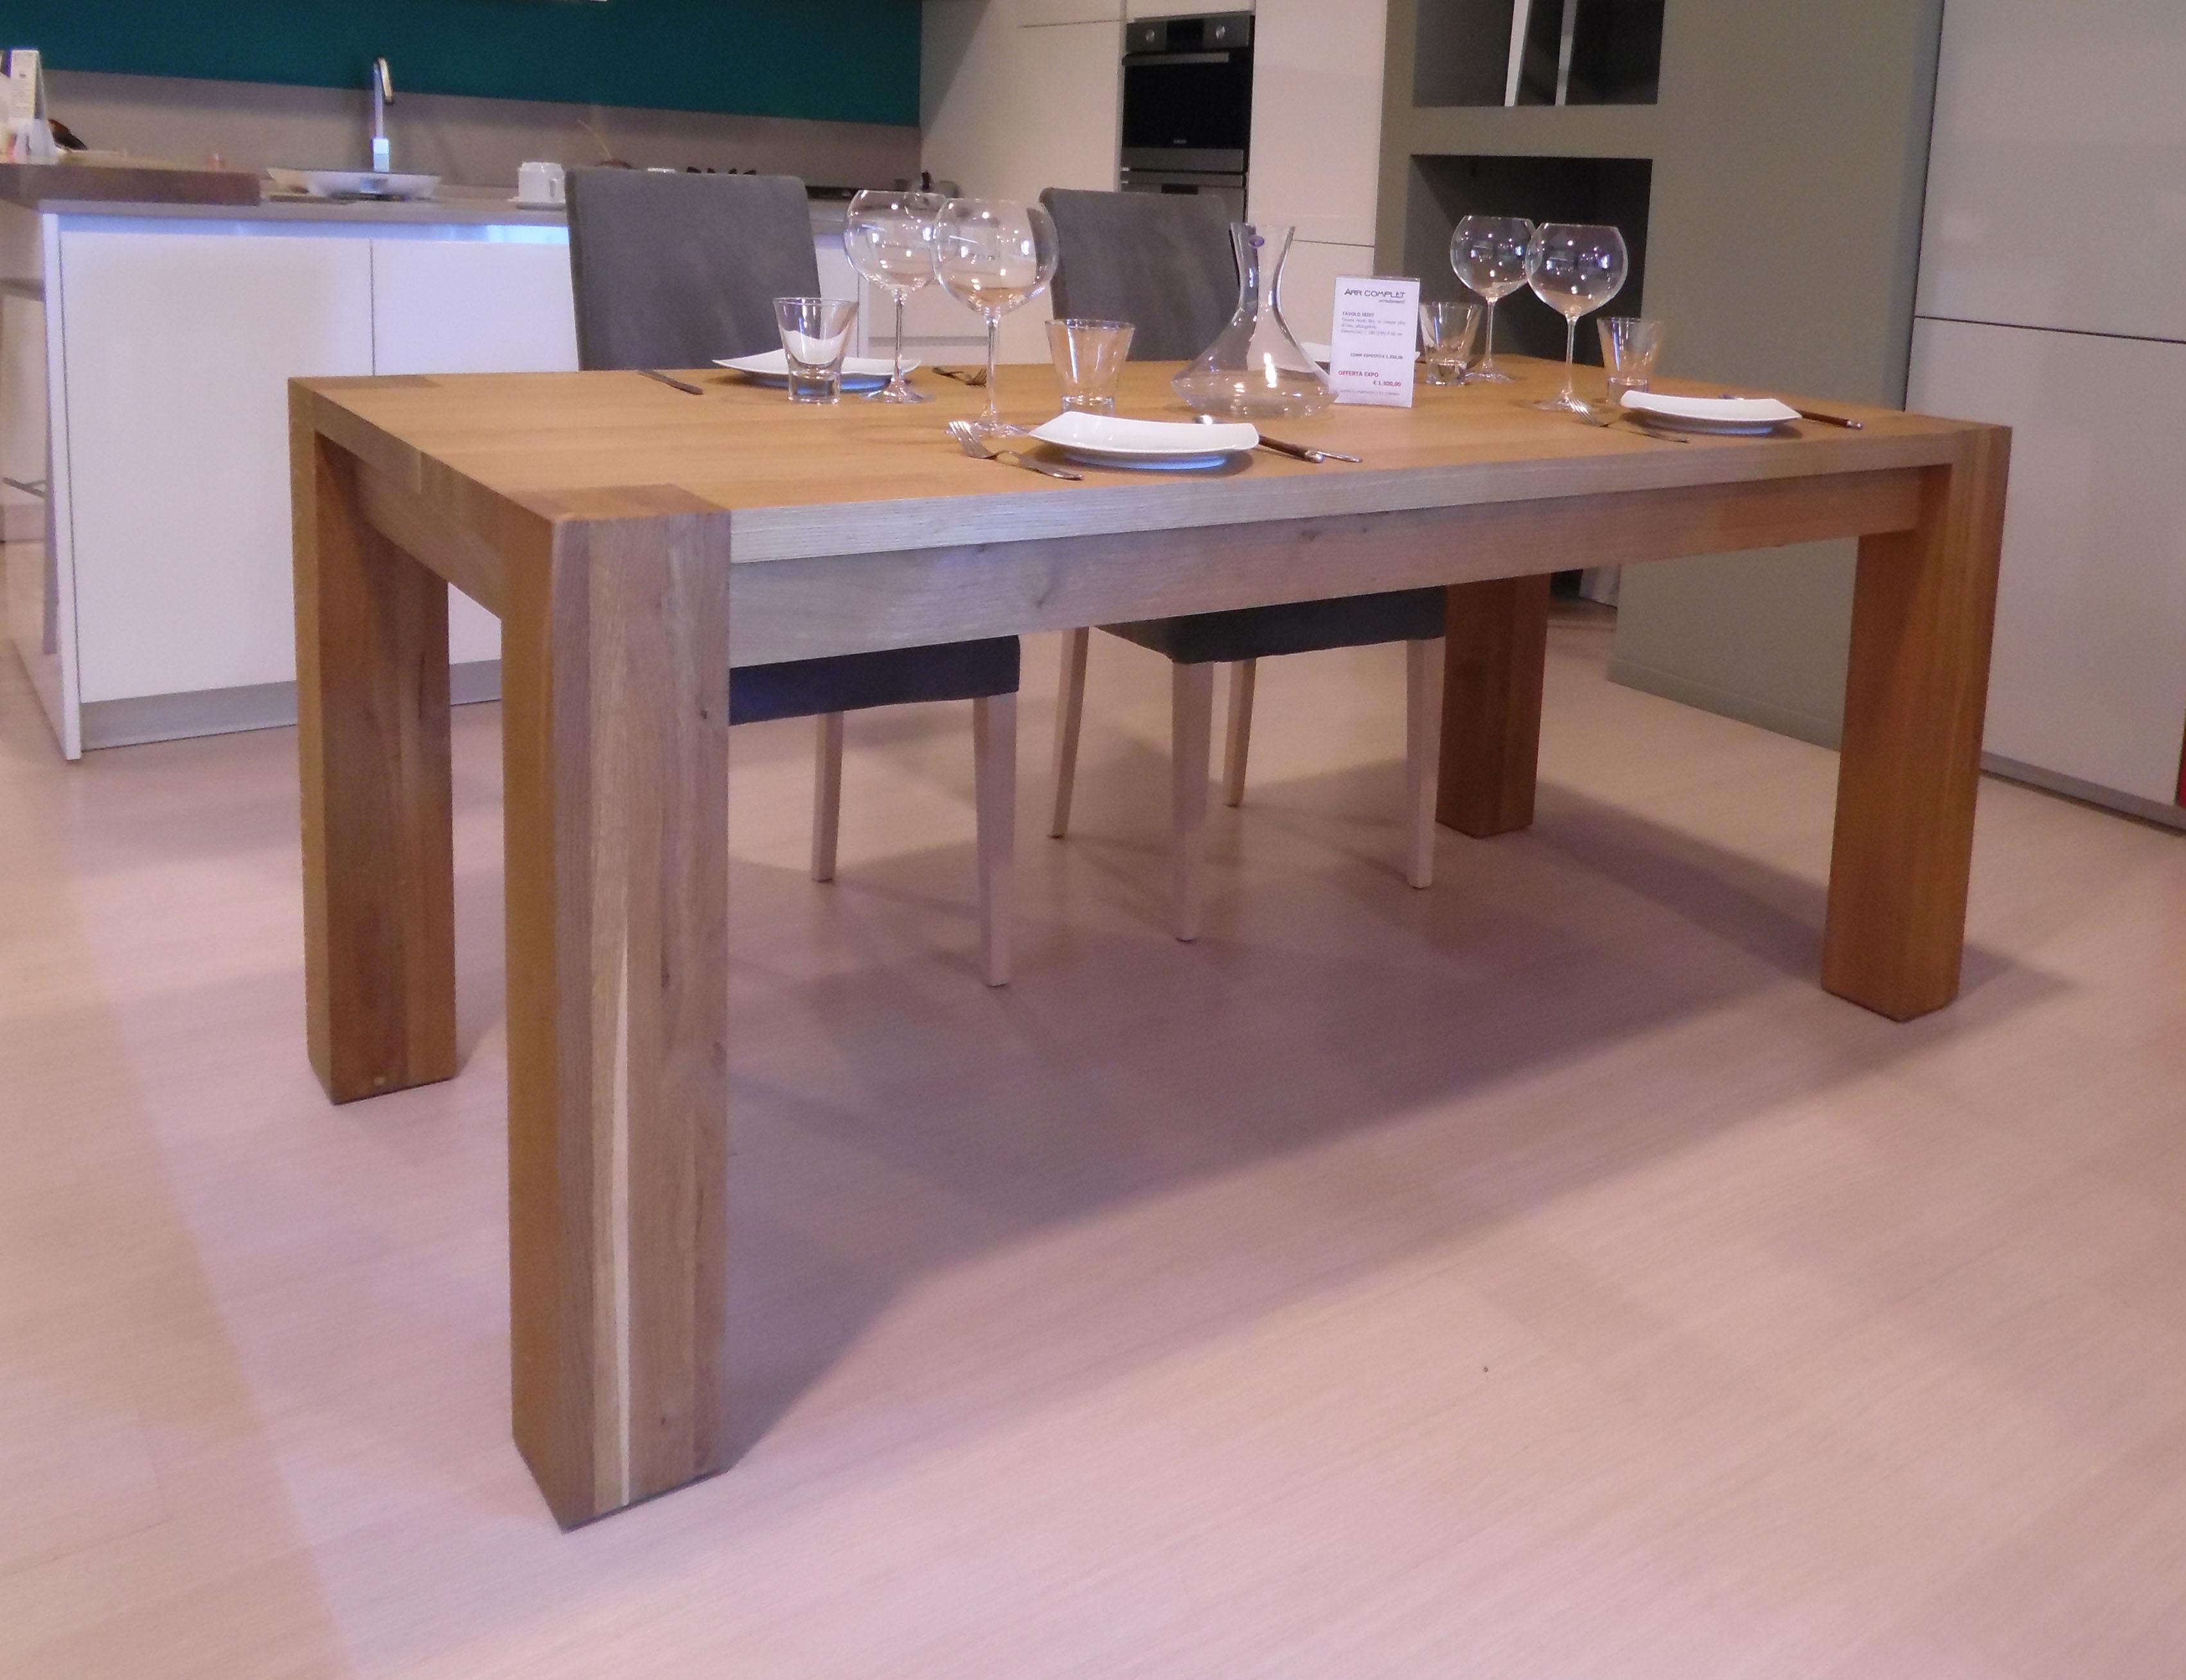 Tavolo sedit bio 180 x 90 rettangolari allungabili - Tavoli rettangolari allungabili in legno ...